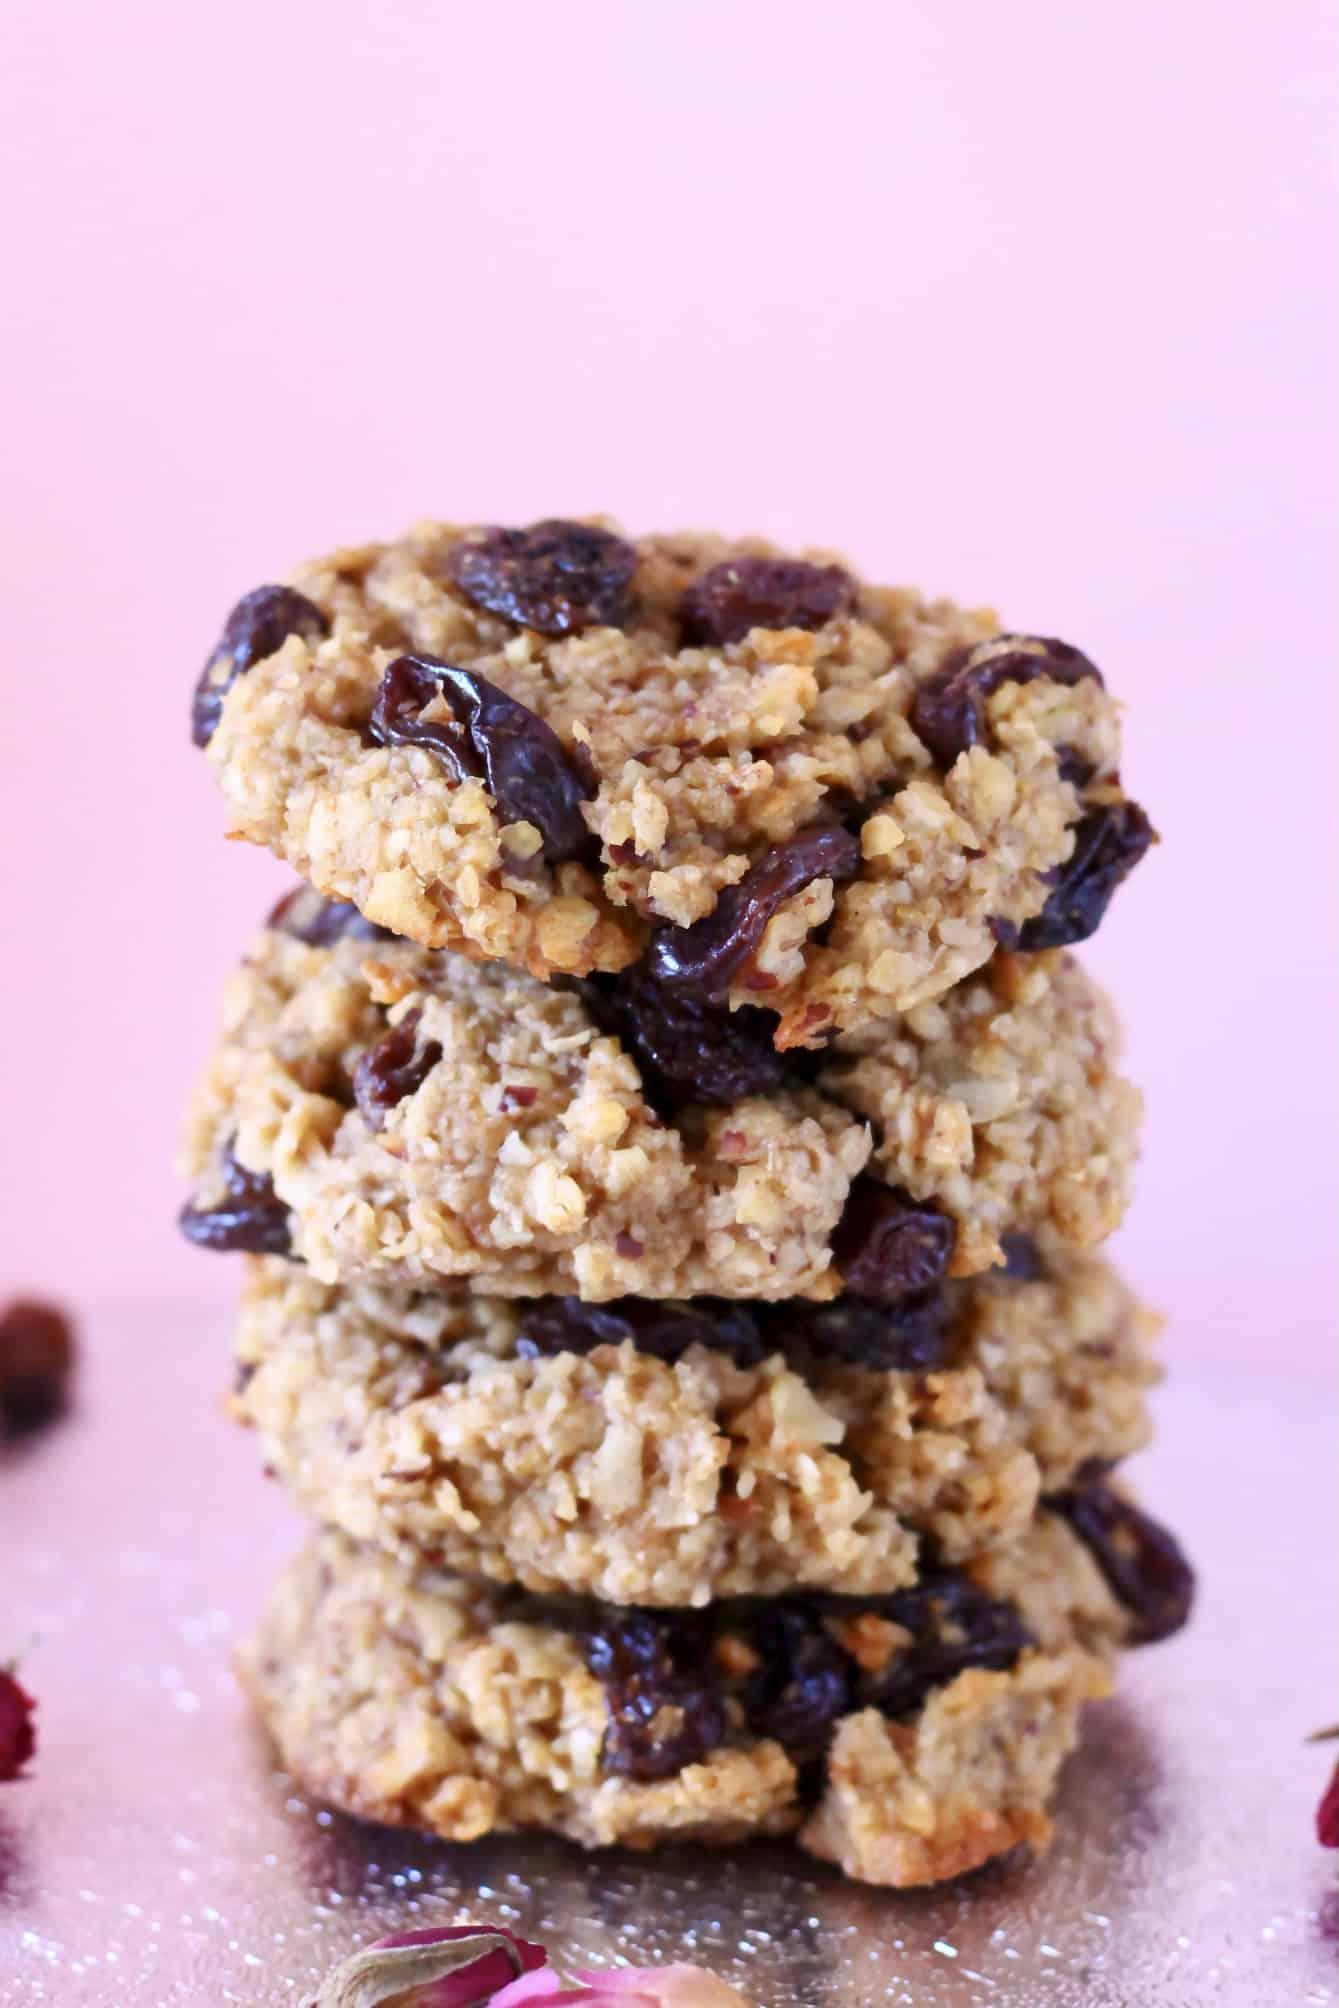 A stack of four gluten-free vegan oatmeal raisin cookies